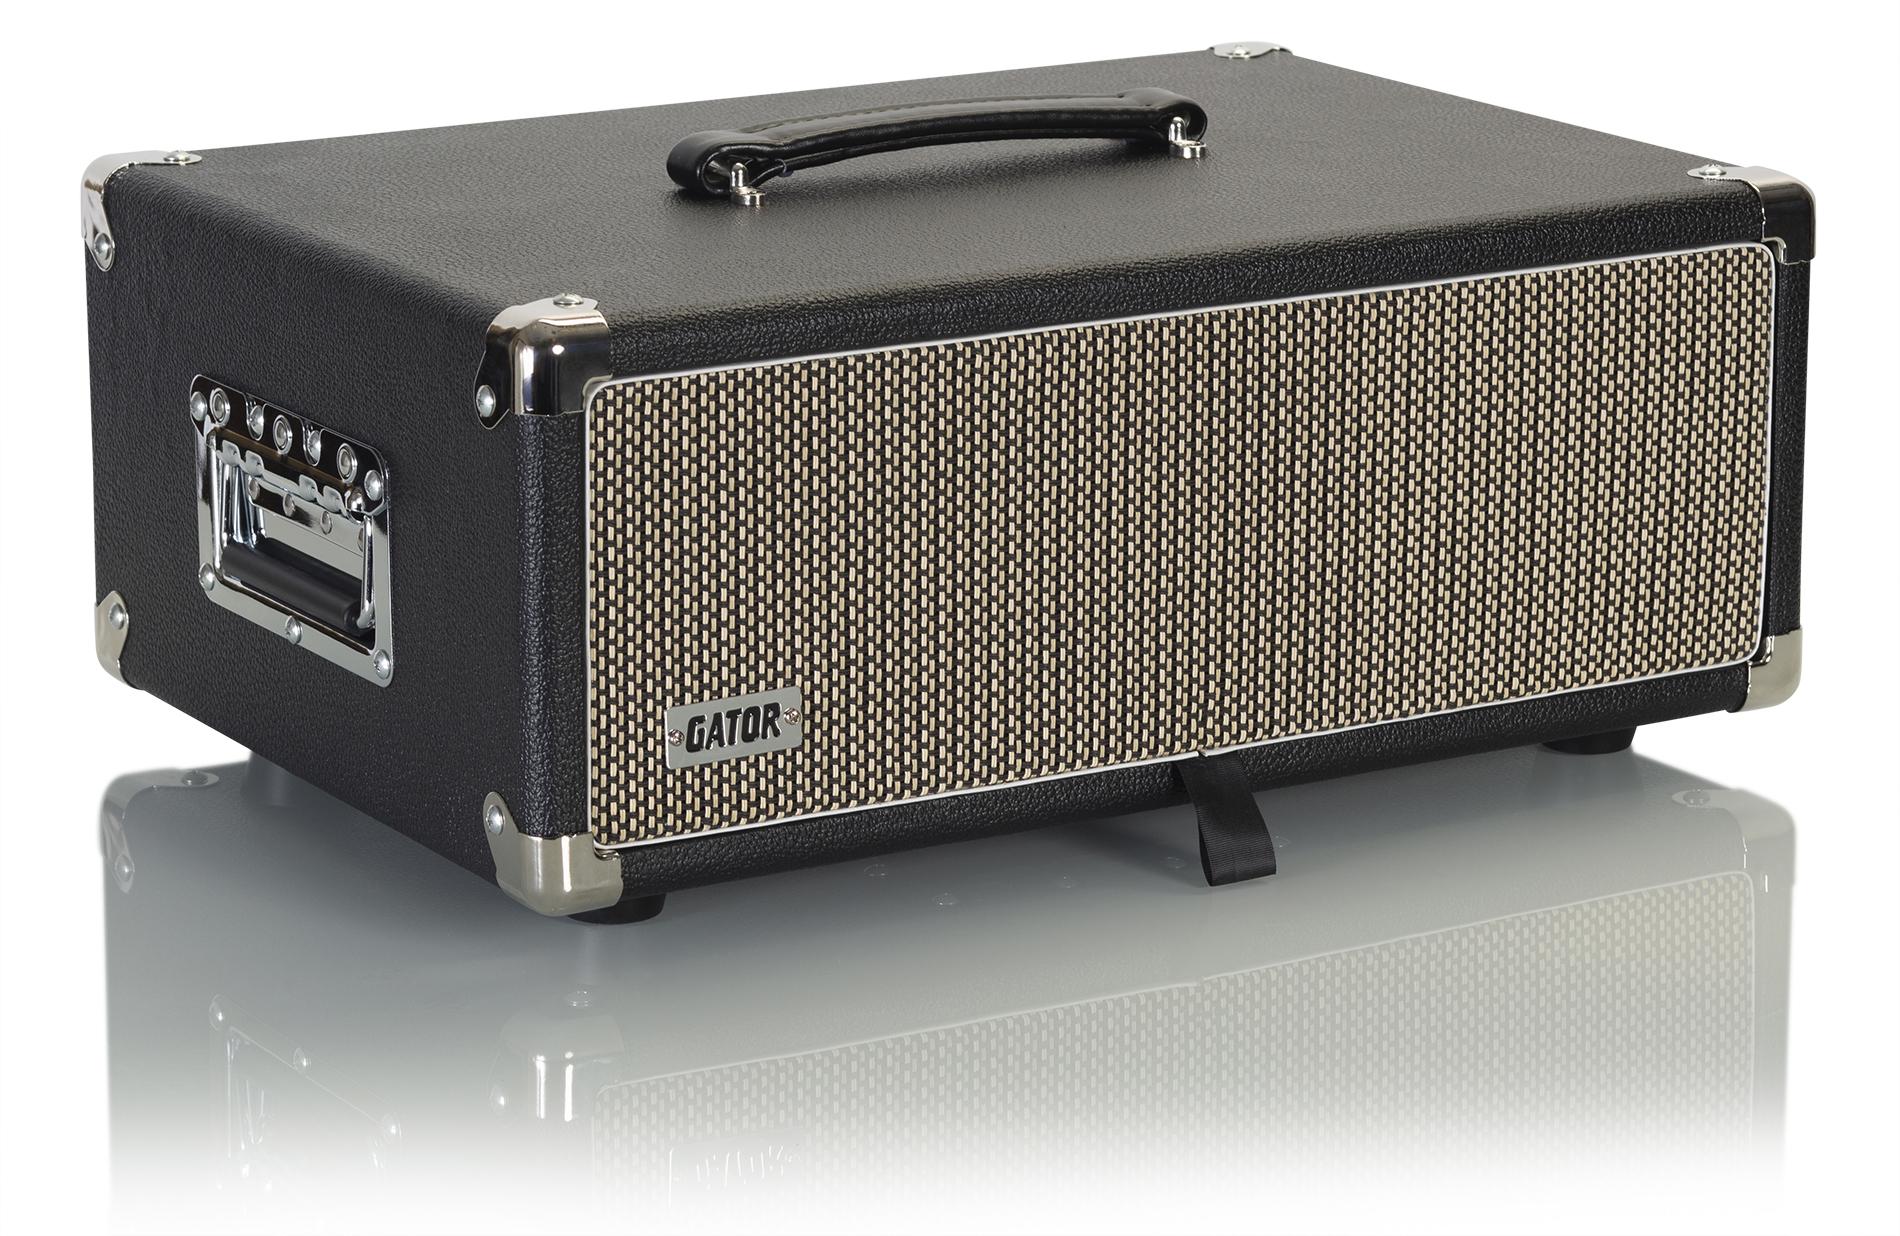 50 s amp style rack case 3u black